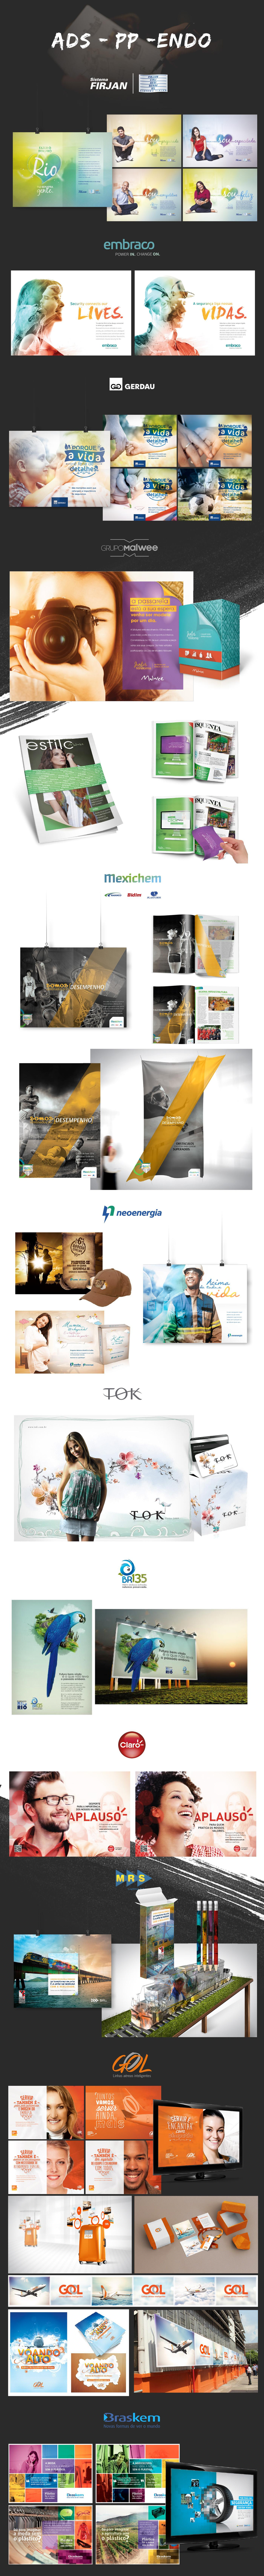 ads anúncio publicidade PP Propaganda endomarketing internal marketing brands